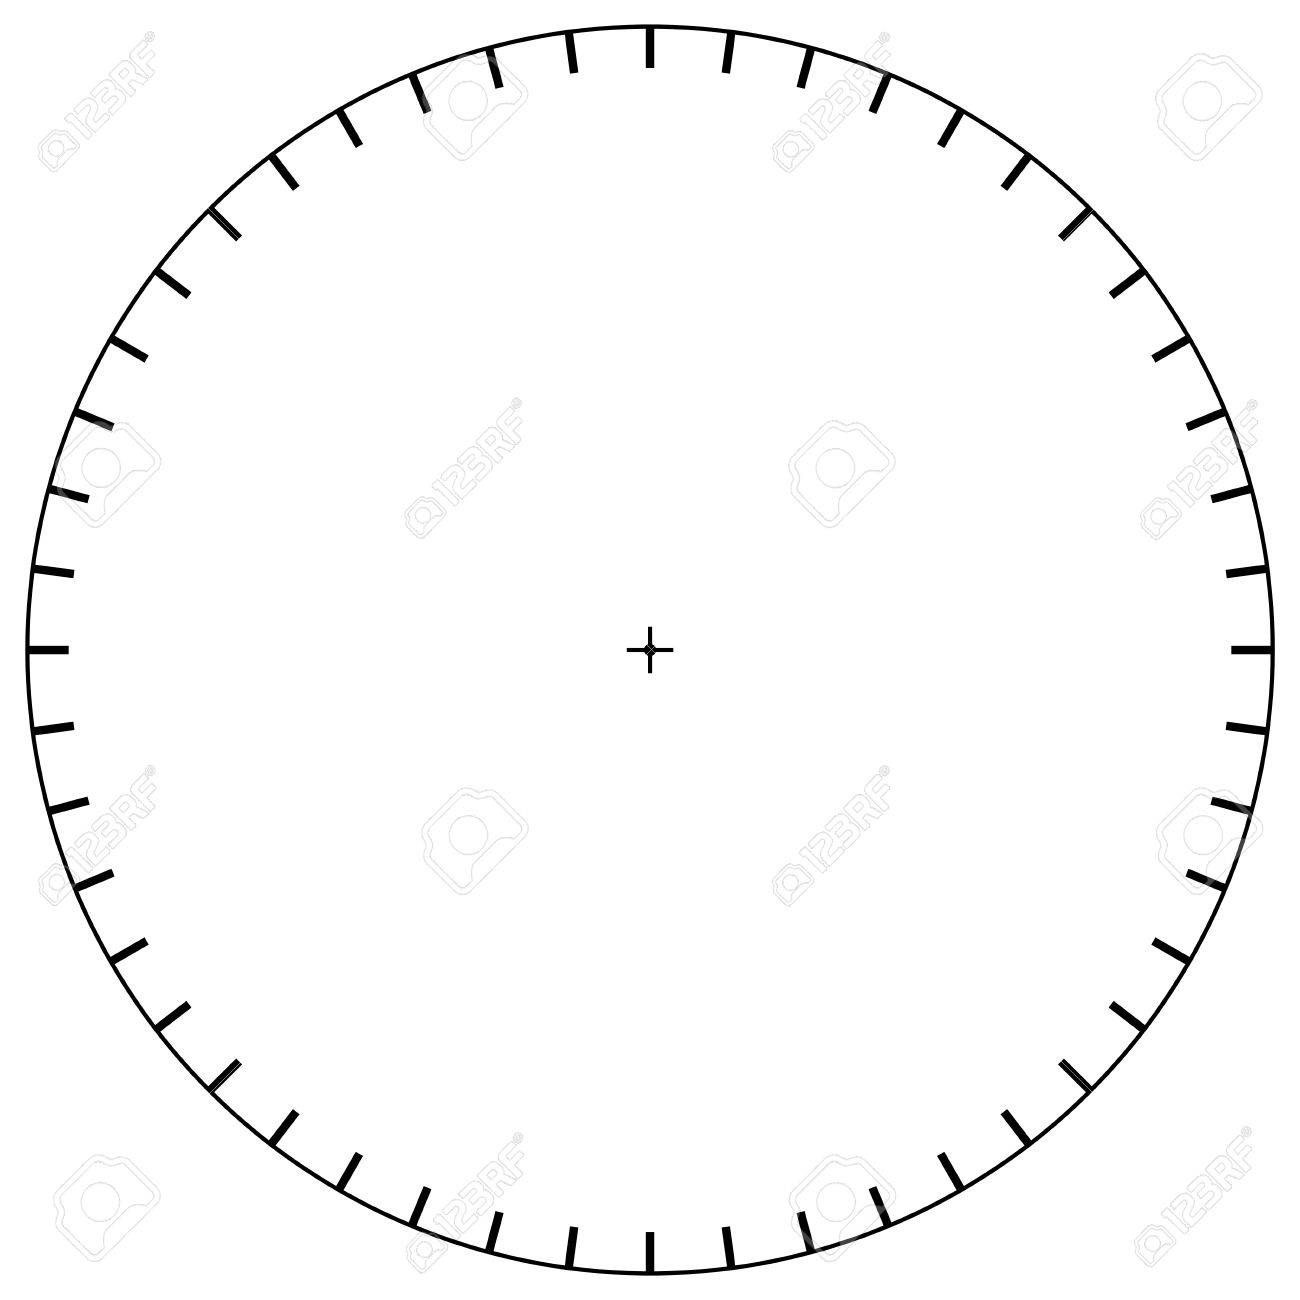 Free Printable Pie Chart